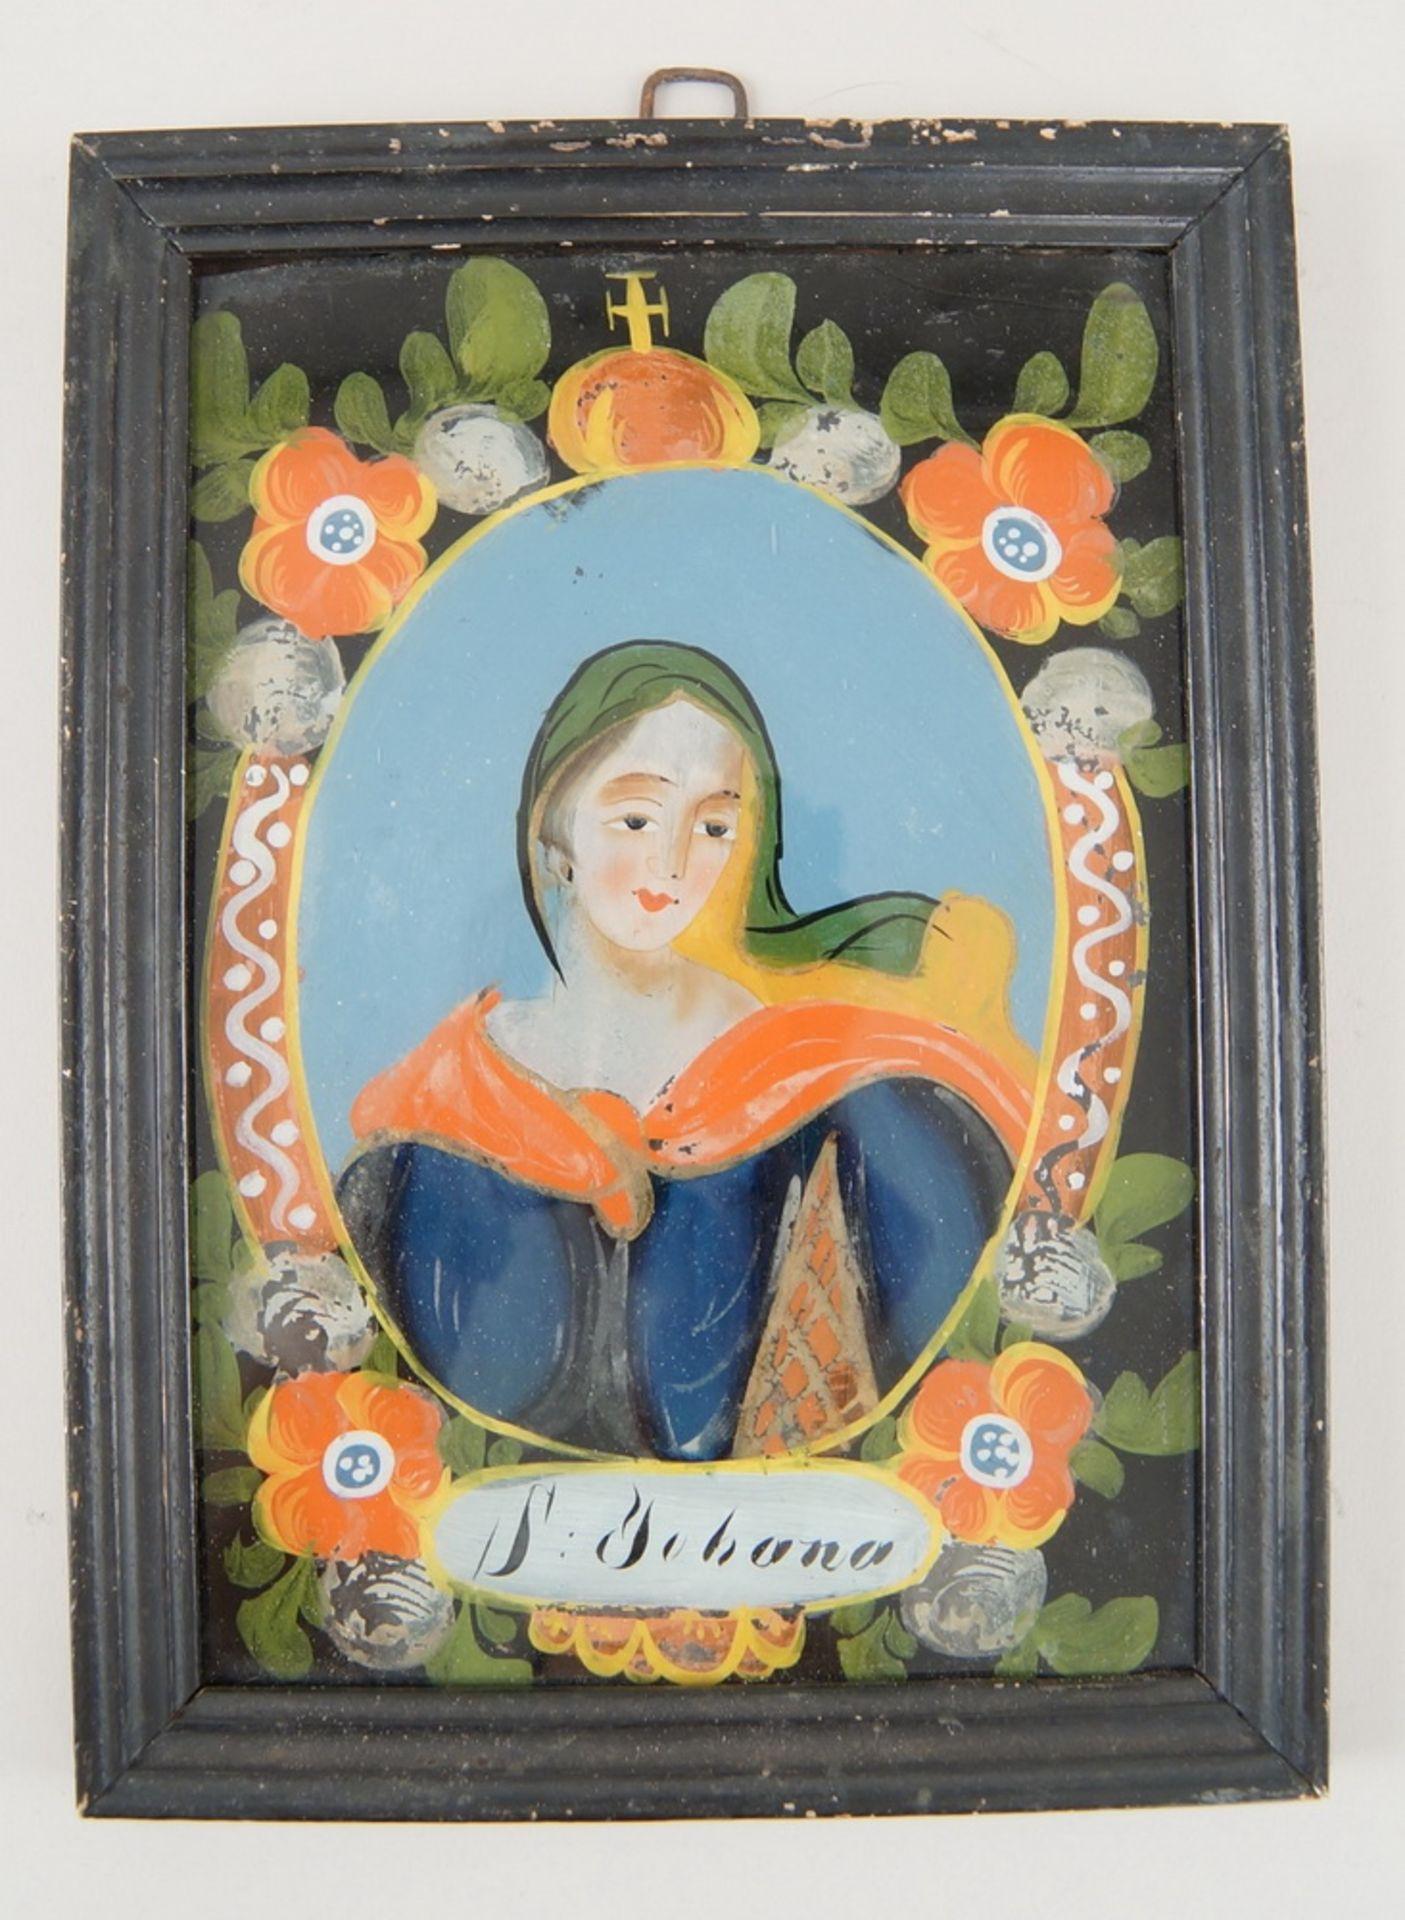 Los 58 - Hinterglasbild / Hinterglasmalerei, heilige Johanna (S. Johana), mit Holzrahmen, 24,5x18cm